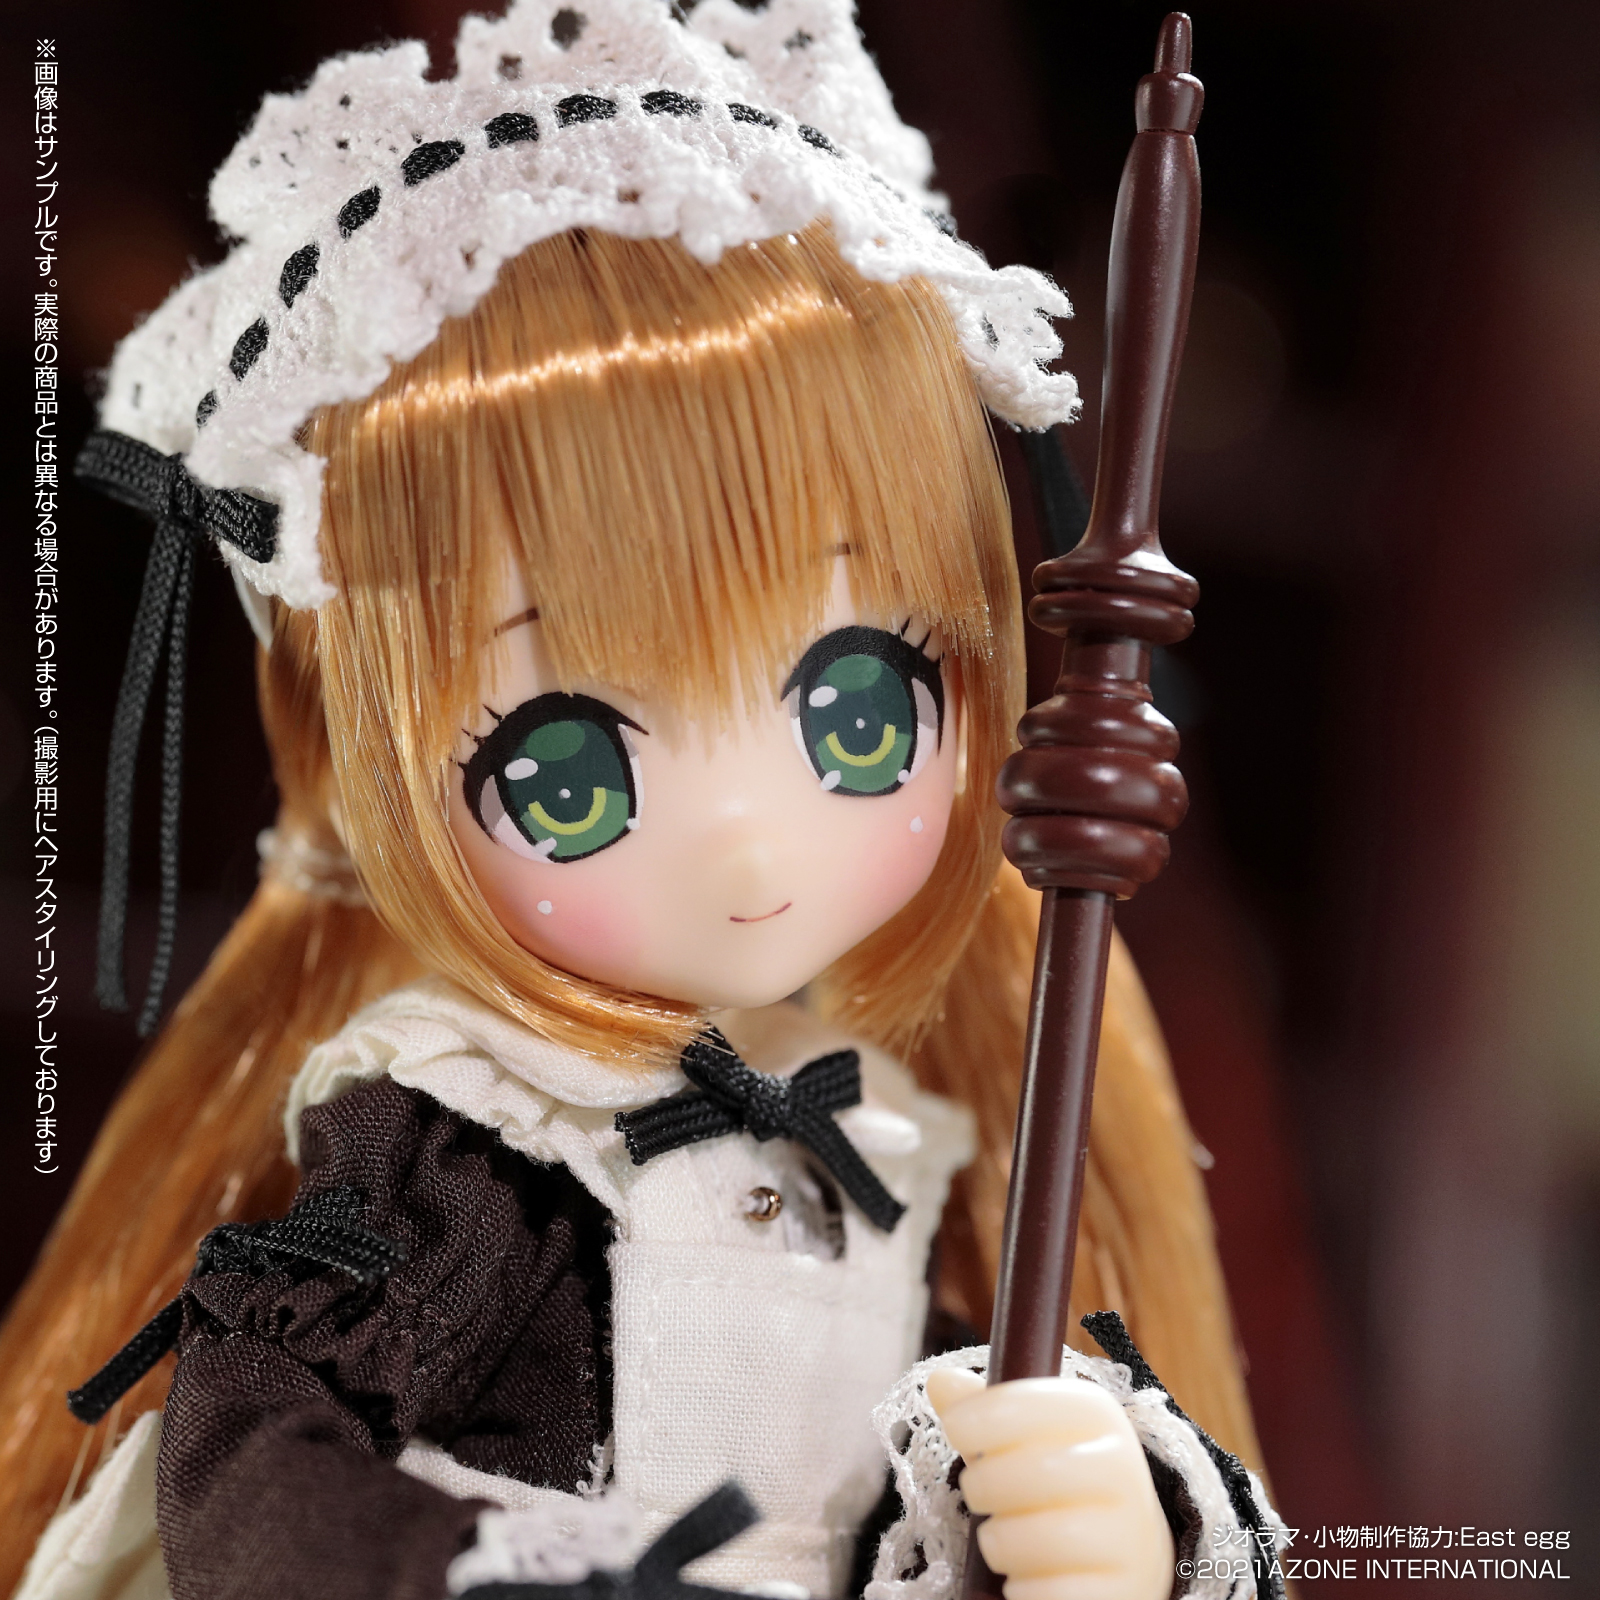 Lil'Fairy ~ちいさなお手伝いさん~『リプー 7th anniv.(ノーマル口ver.)』1/12 完成品ドール-013